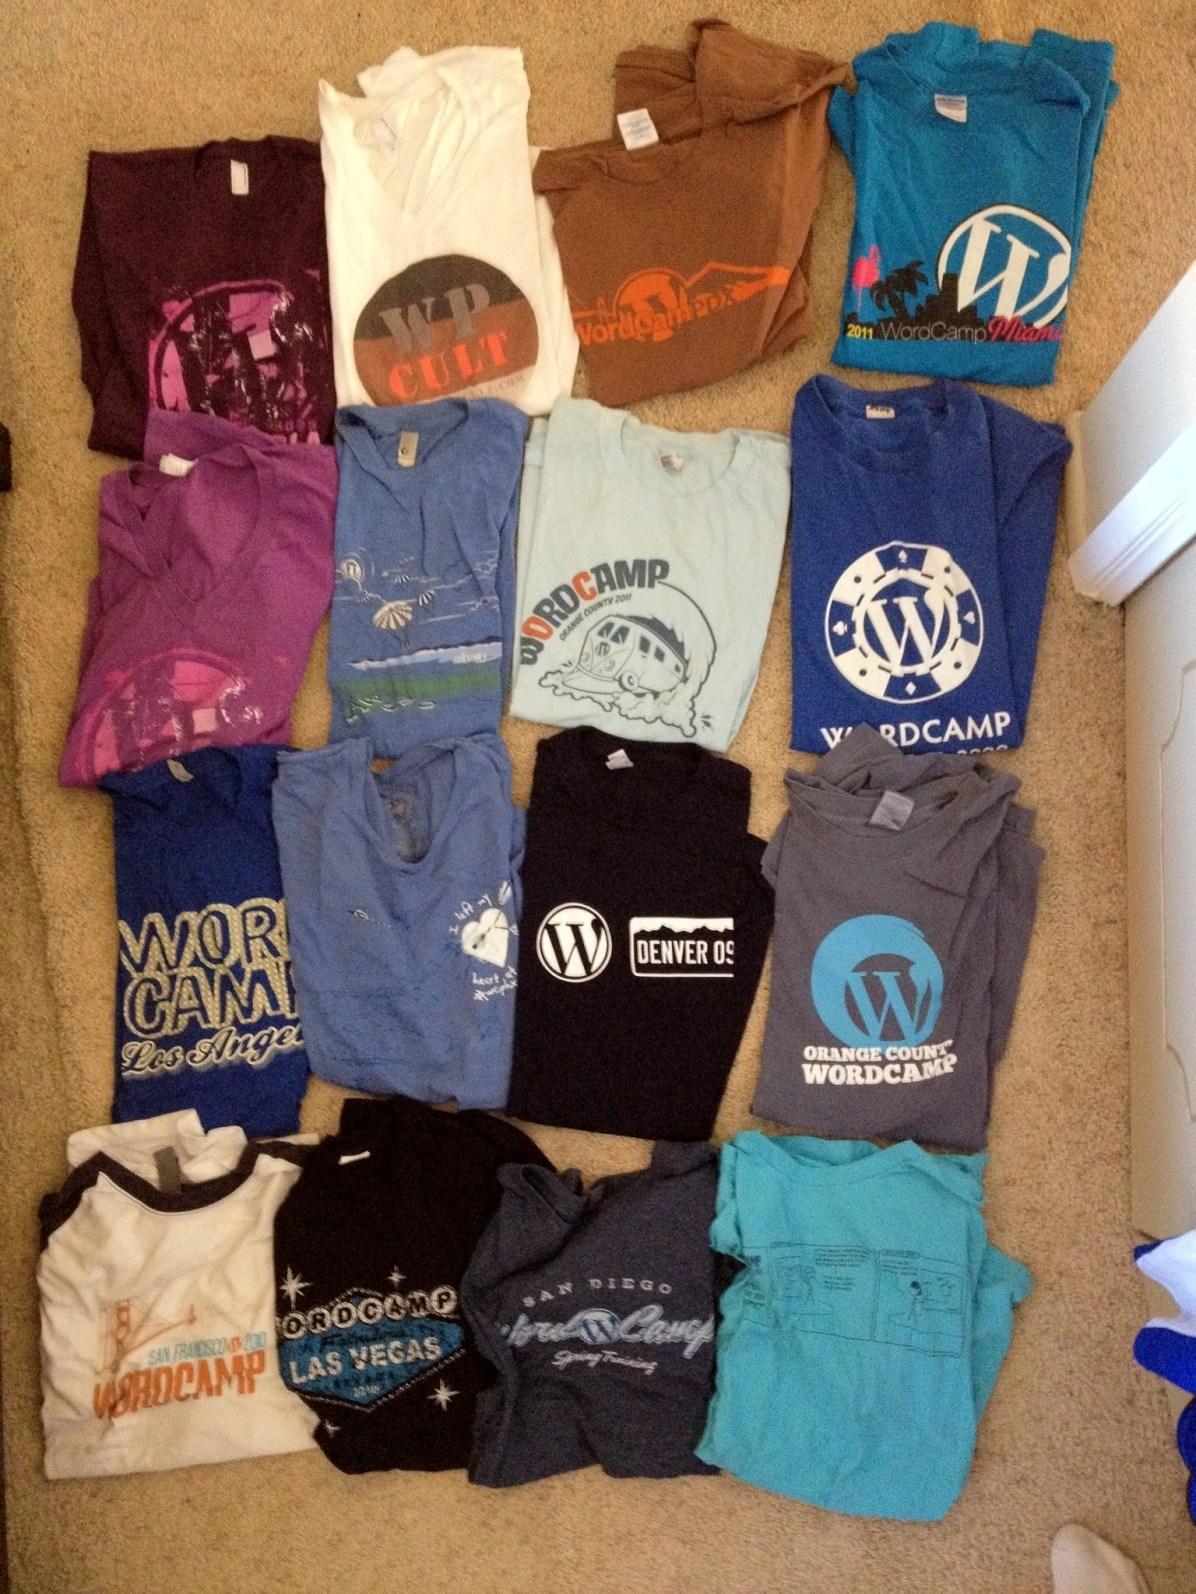 WordCamp shirts